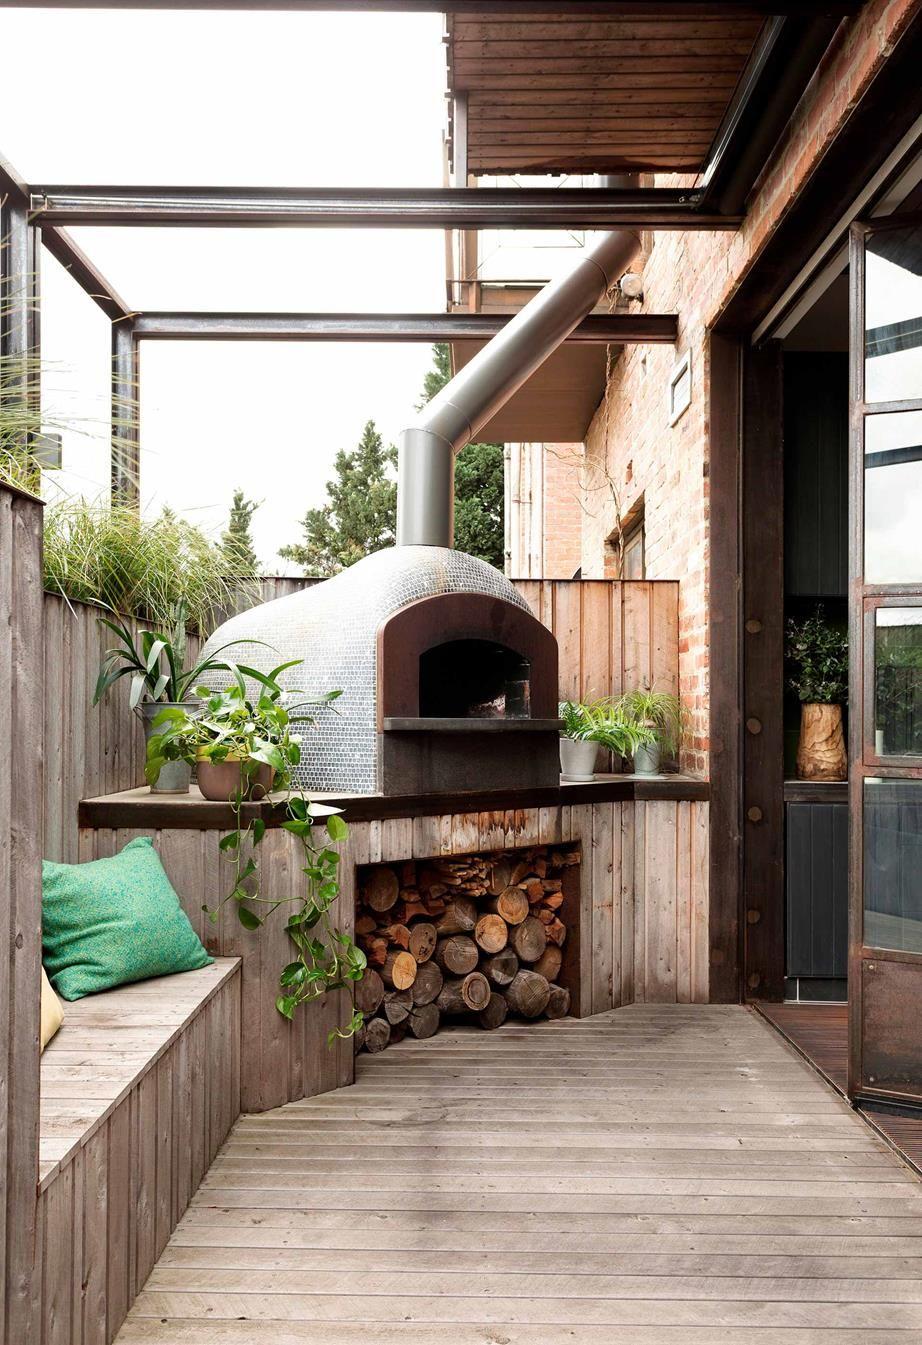 DIY outdoor kitchen 6 building tips to know Diy outdoor